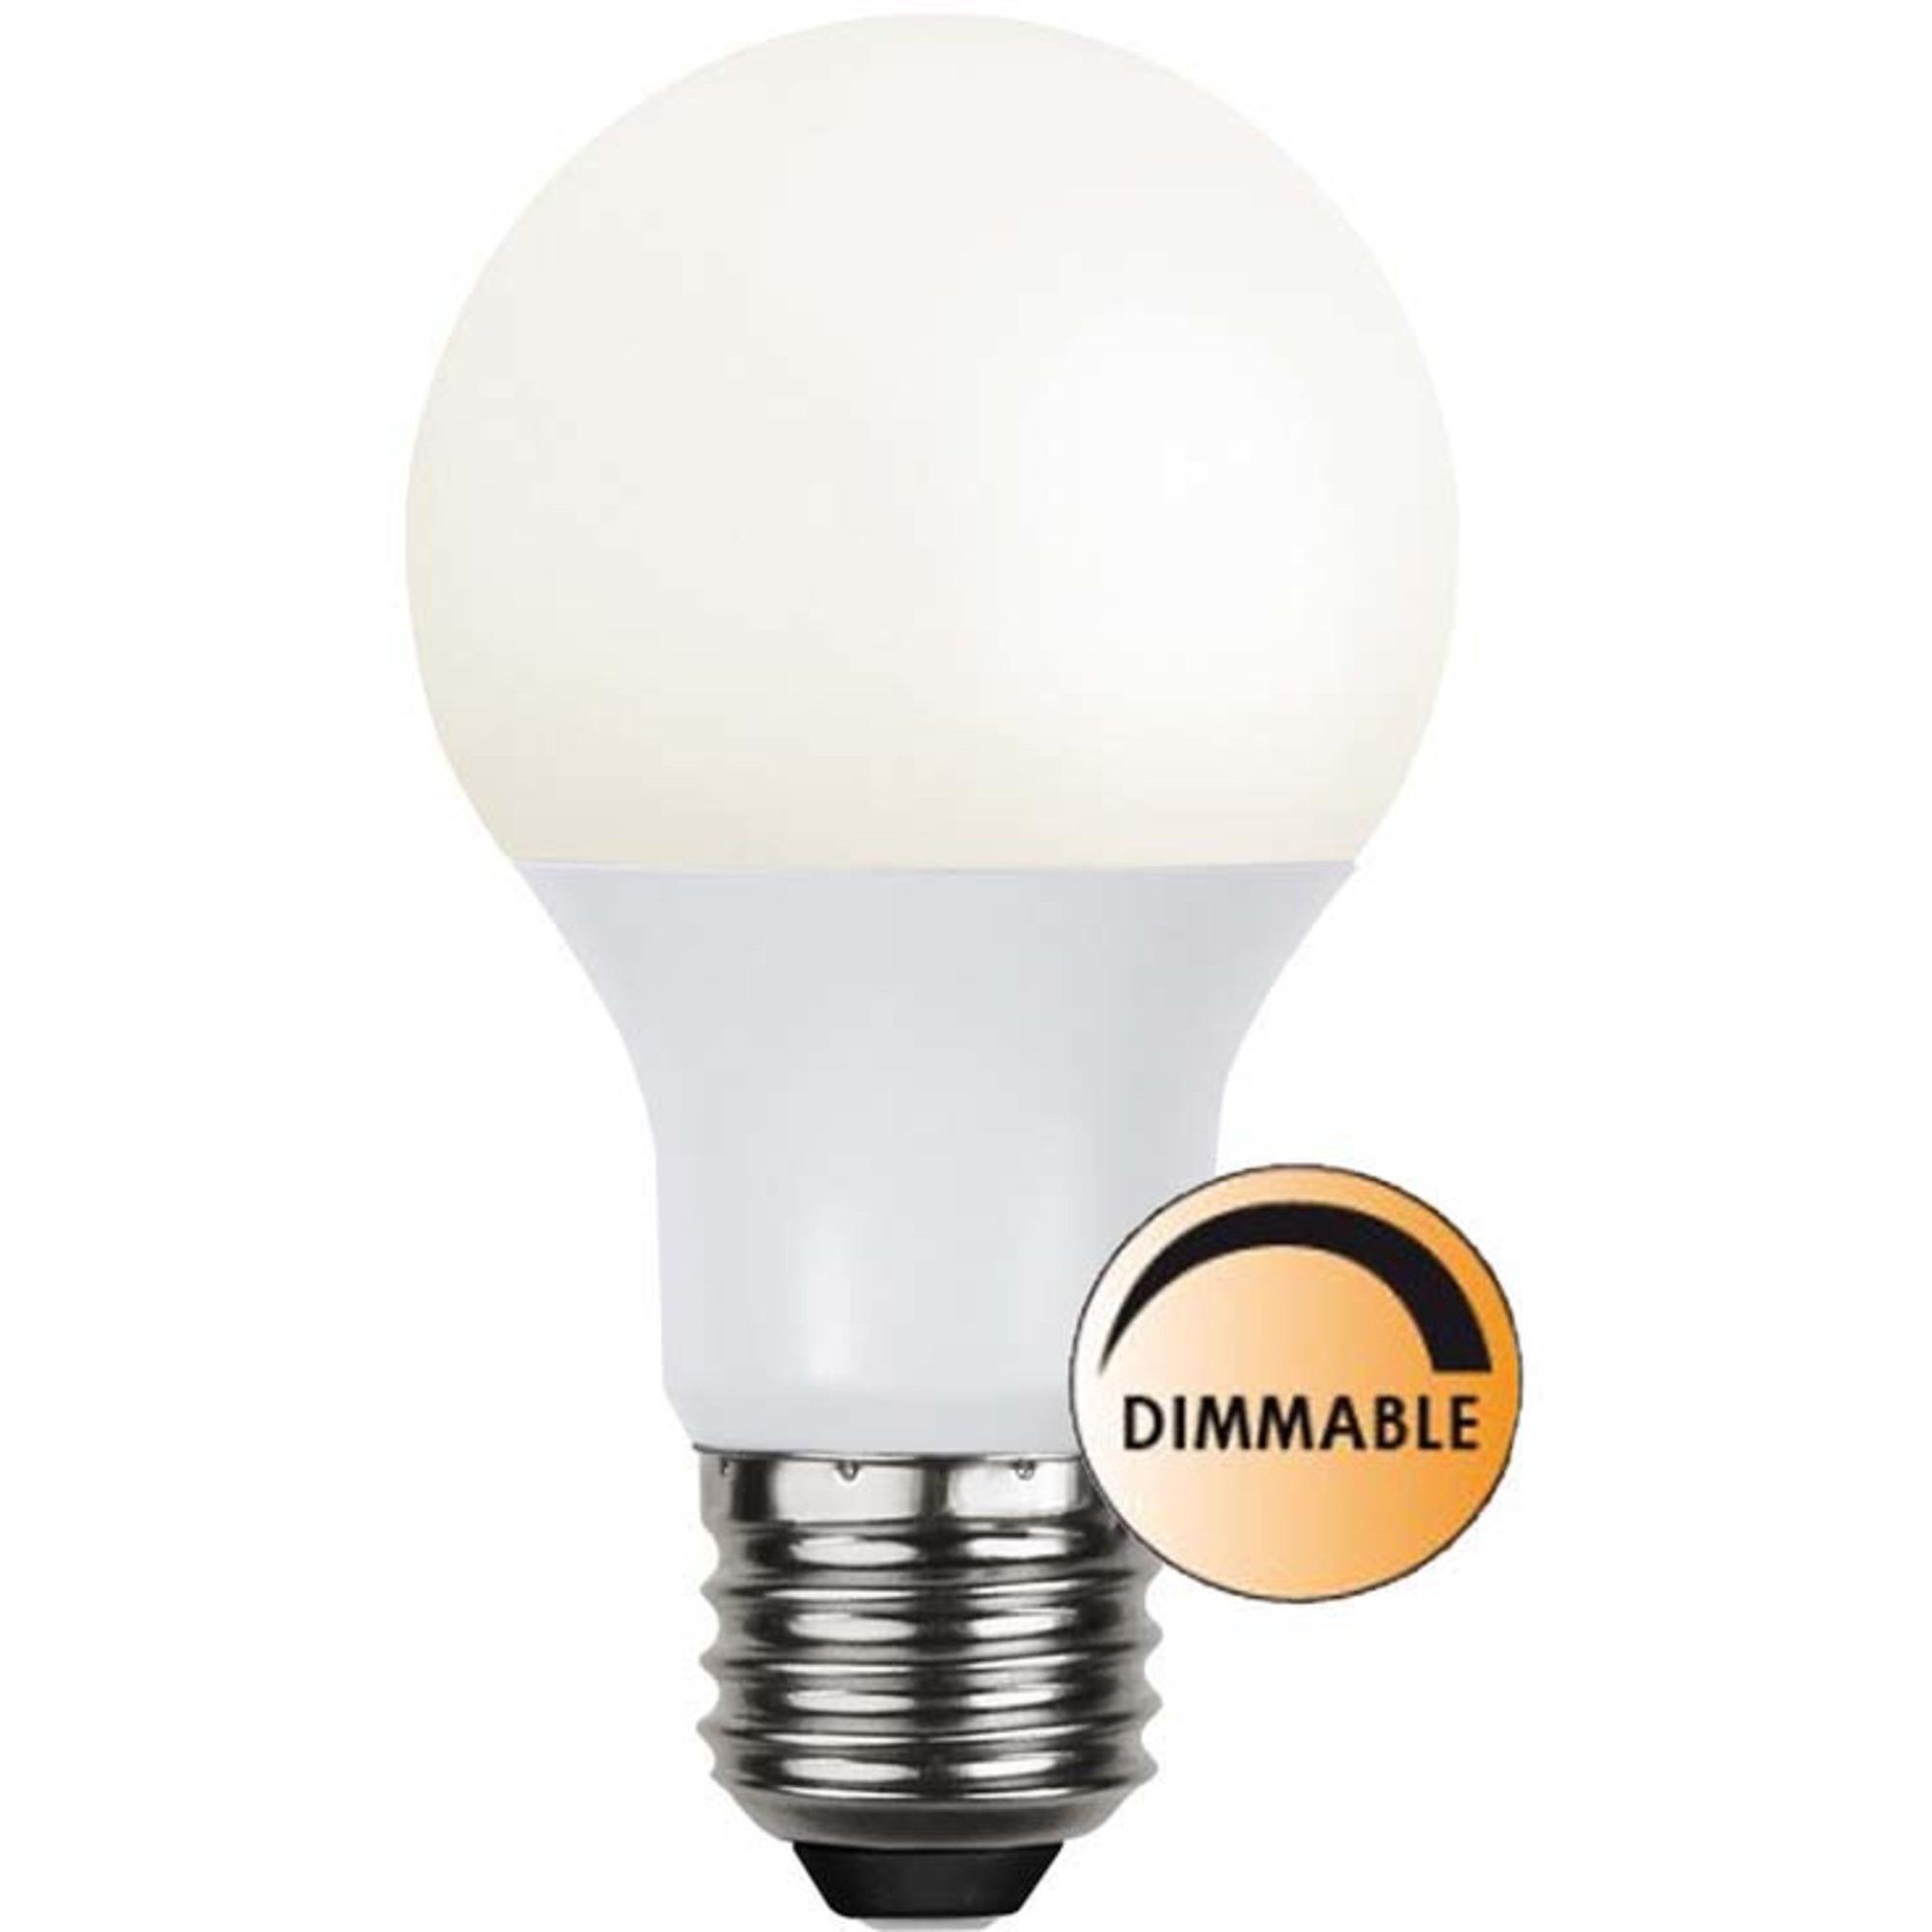 Globen Lighting Ljuskälla LED 358-68 Normal Opal